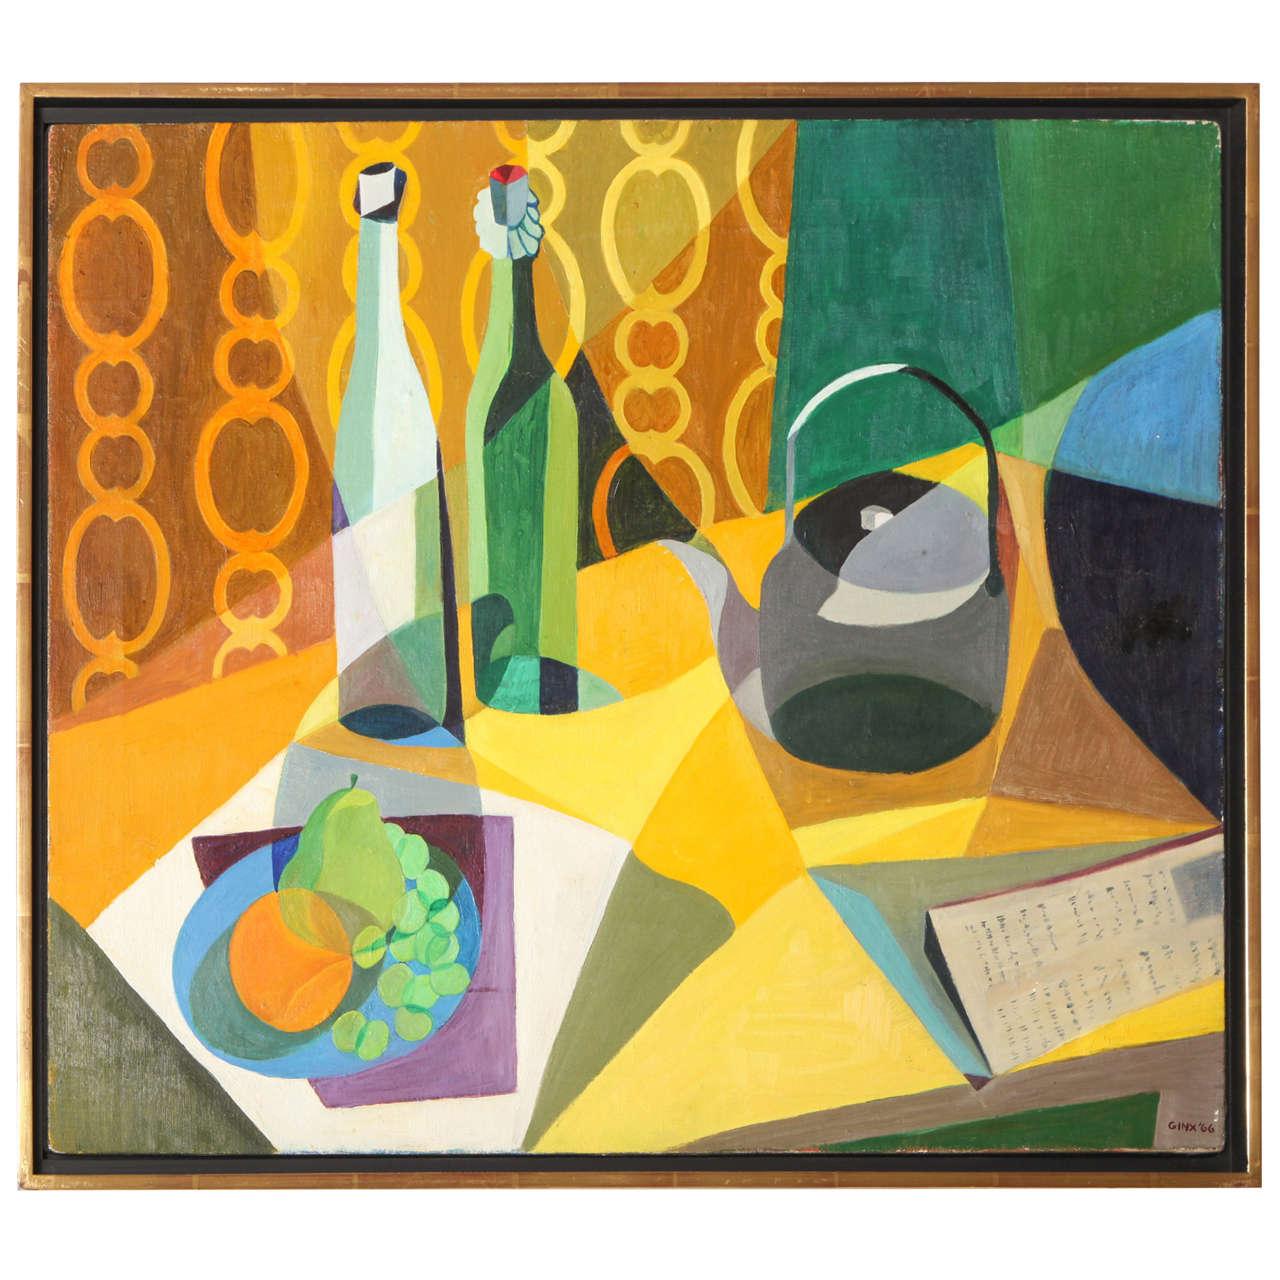 Modernist Still Life, Oil on Canvas by Ginx